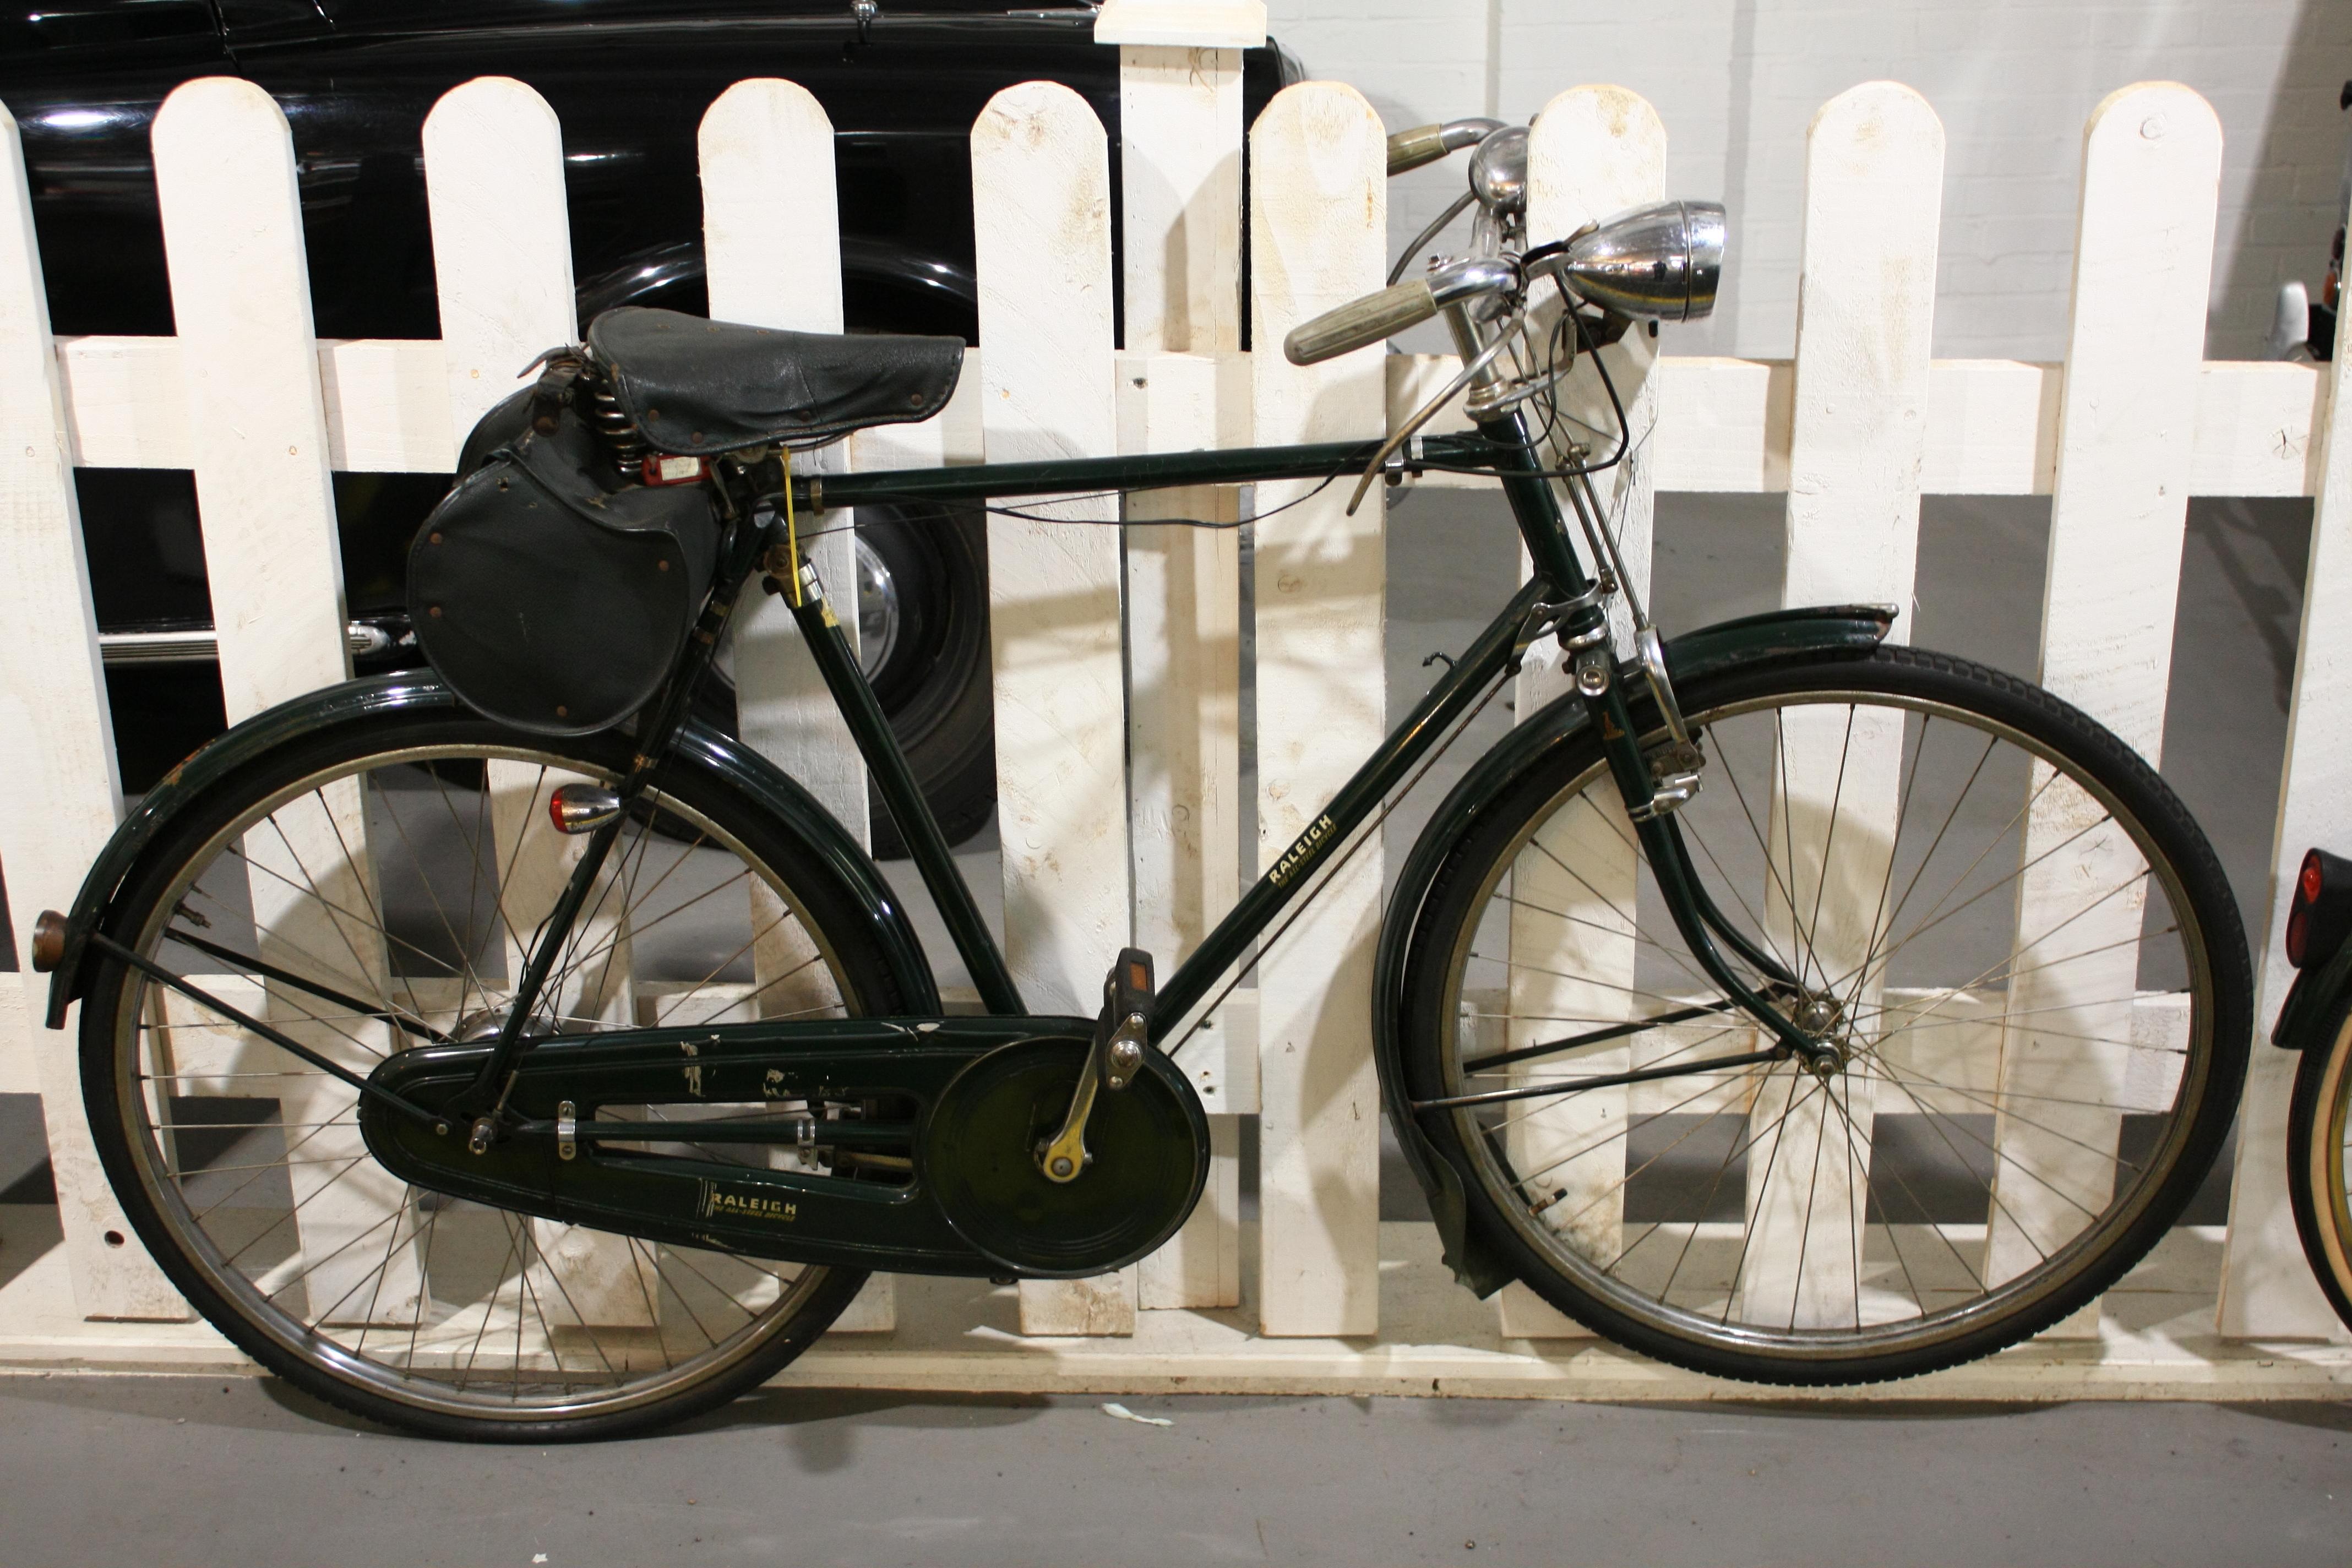 5e6e18d6d3b Bicicleta inglesa - Wikipedia, la enciclopedia libre